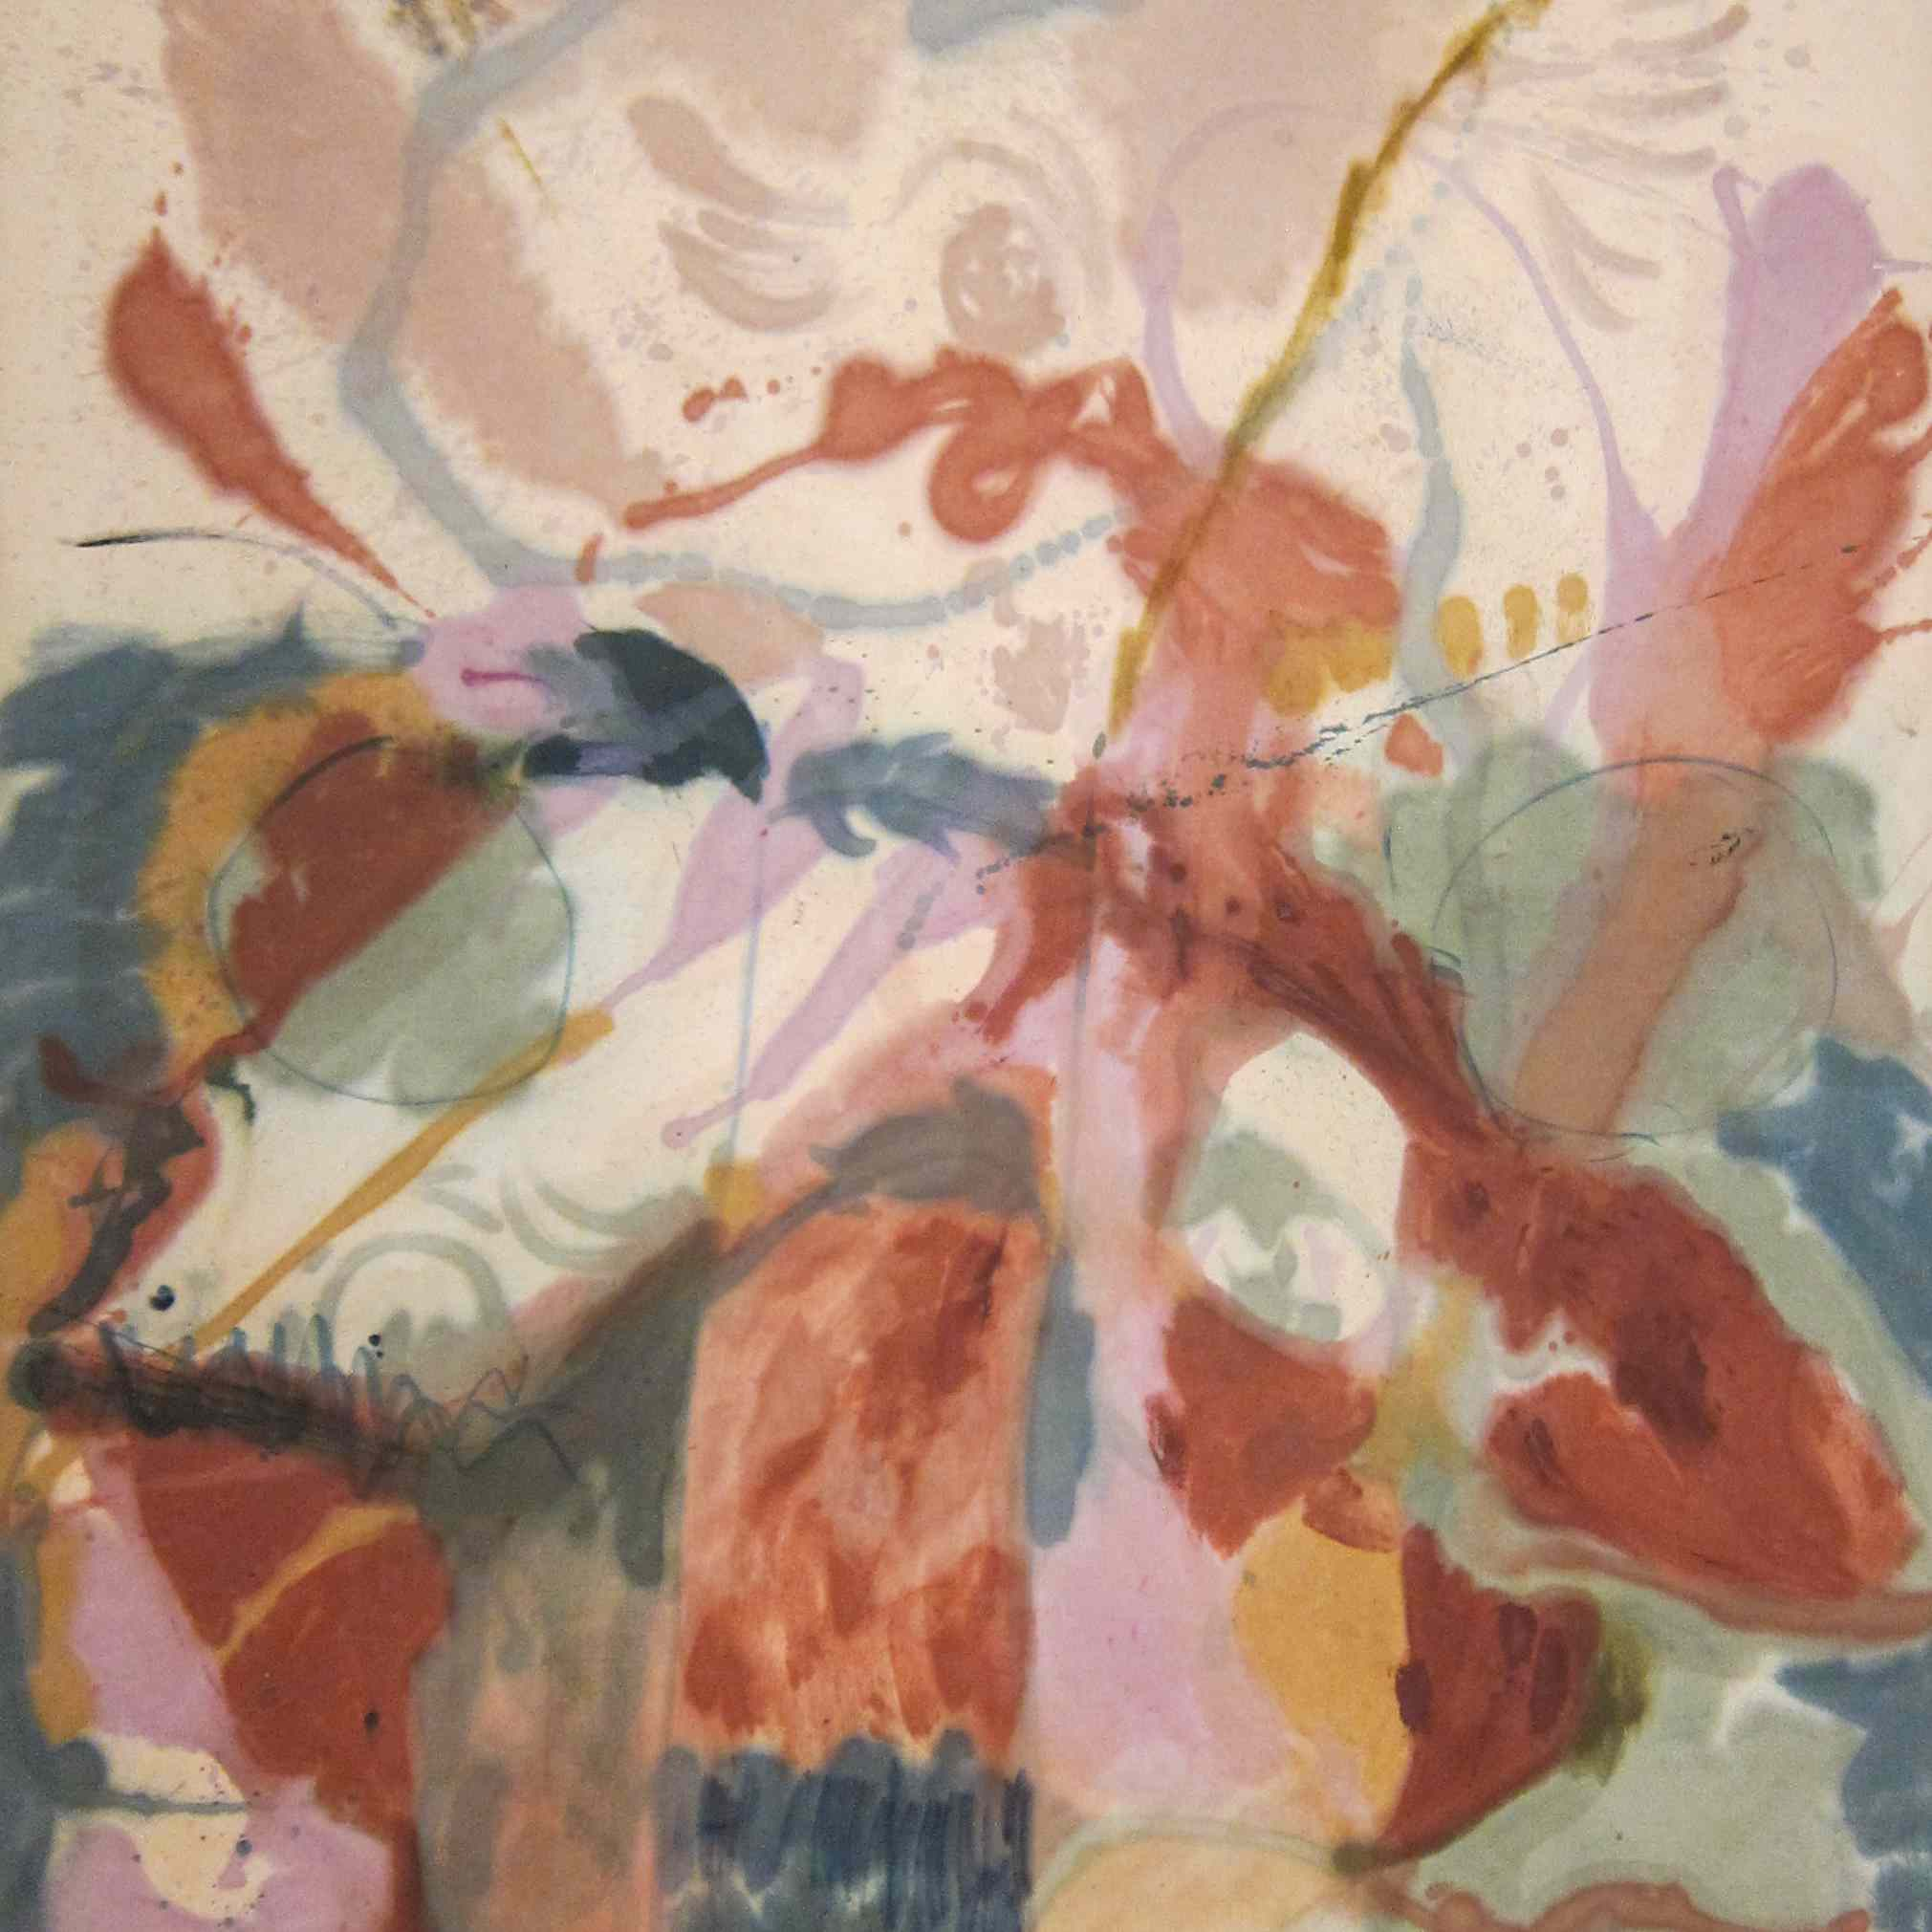 Helen Frankenthaler, Jacob's Ladder